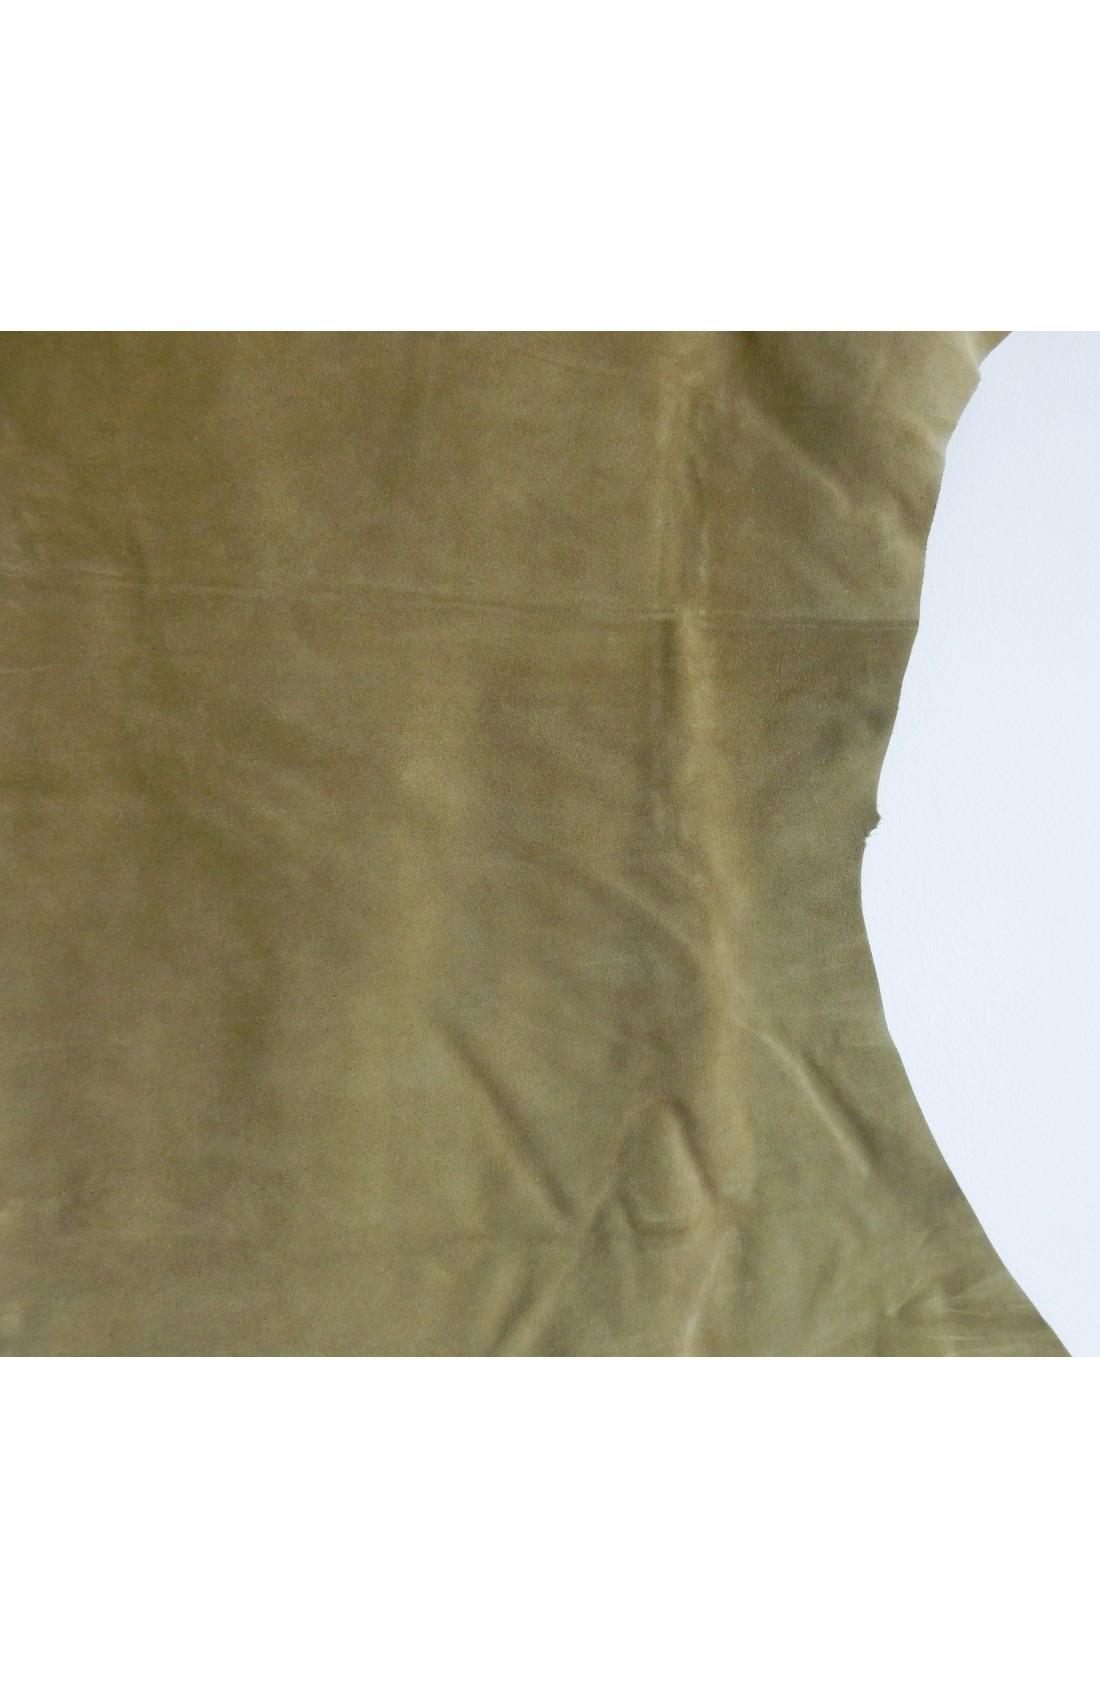 art. 60 SCAMOSCIATO var.64 verde lime (2)